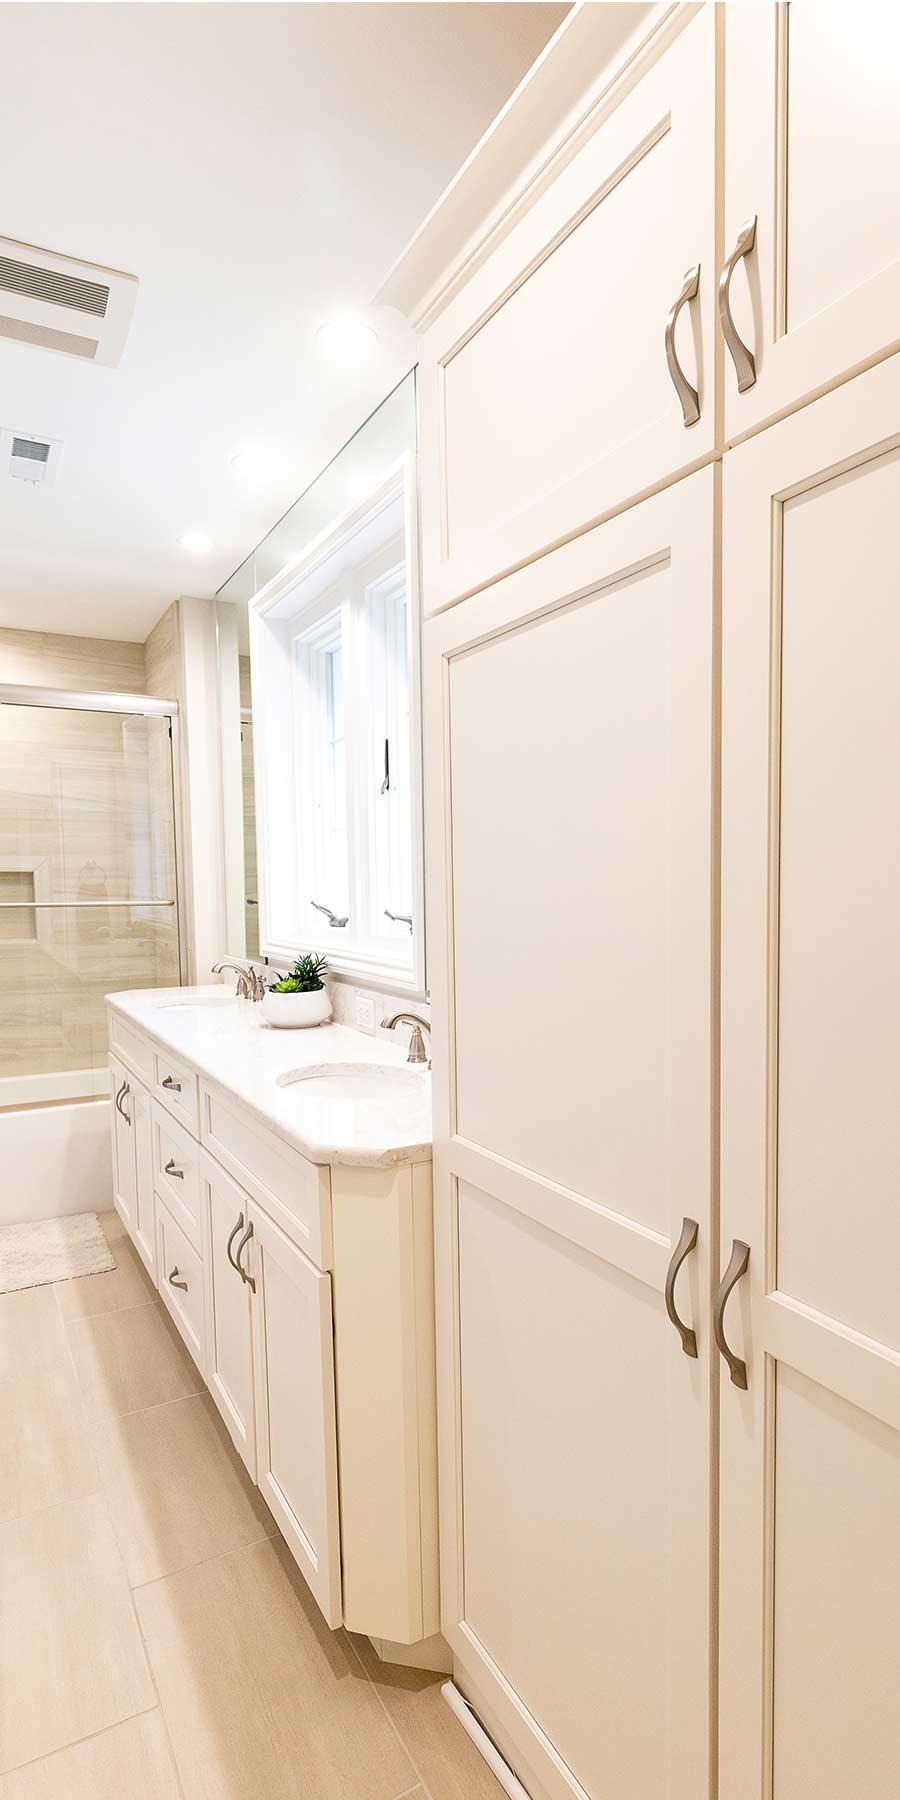 Bathroom Remodel | Studio 11 Cabinets & Design